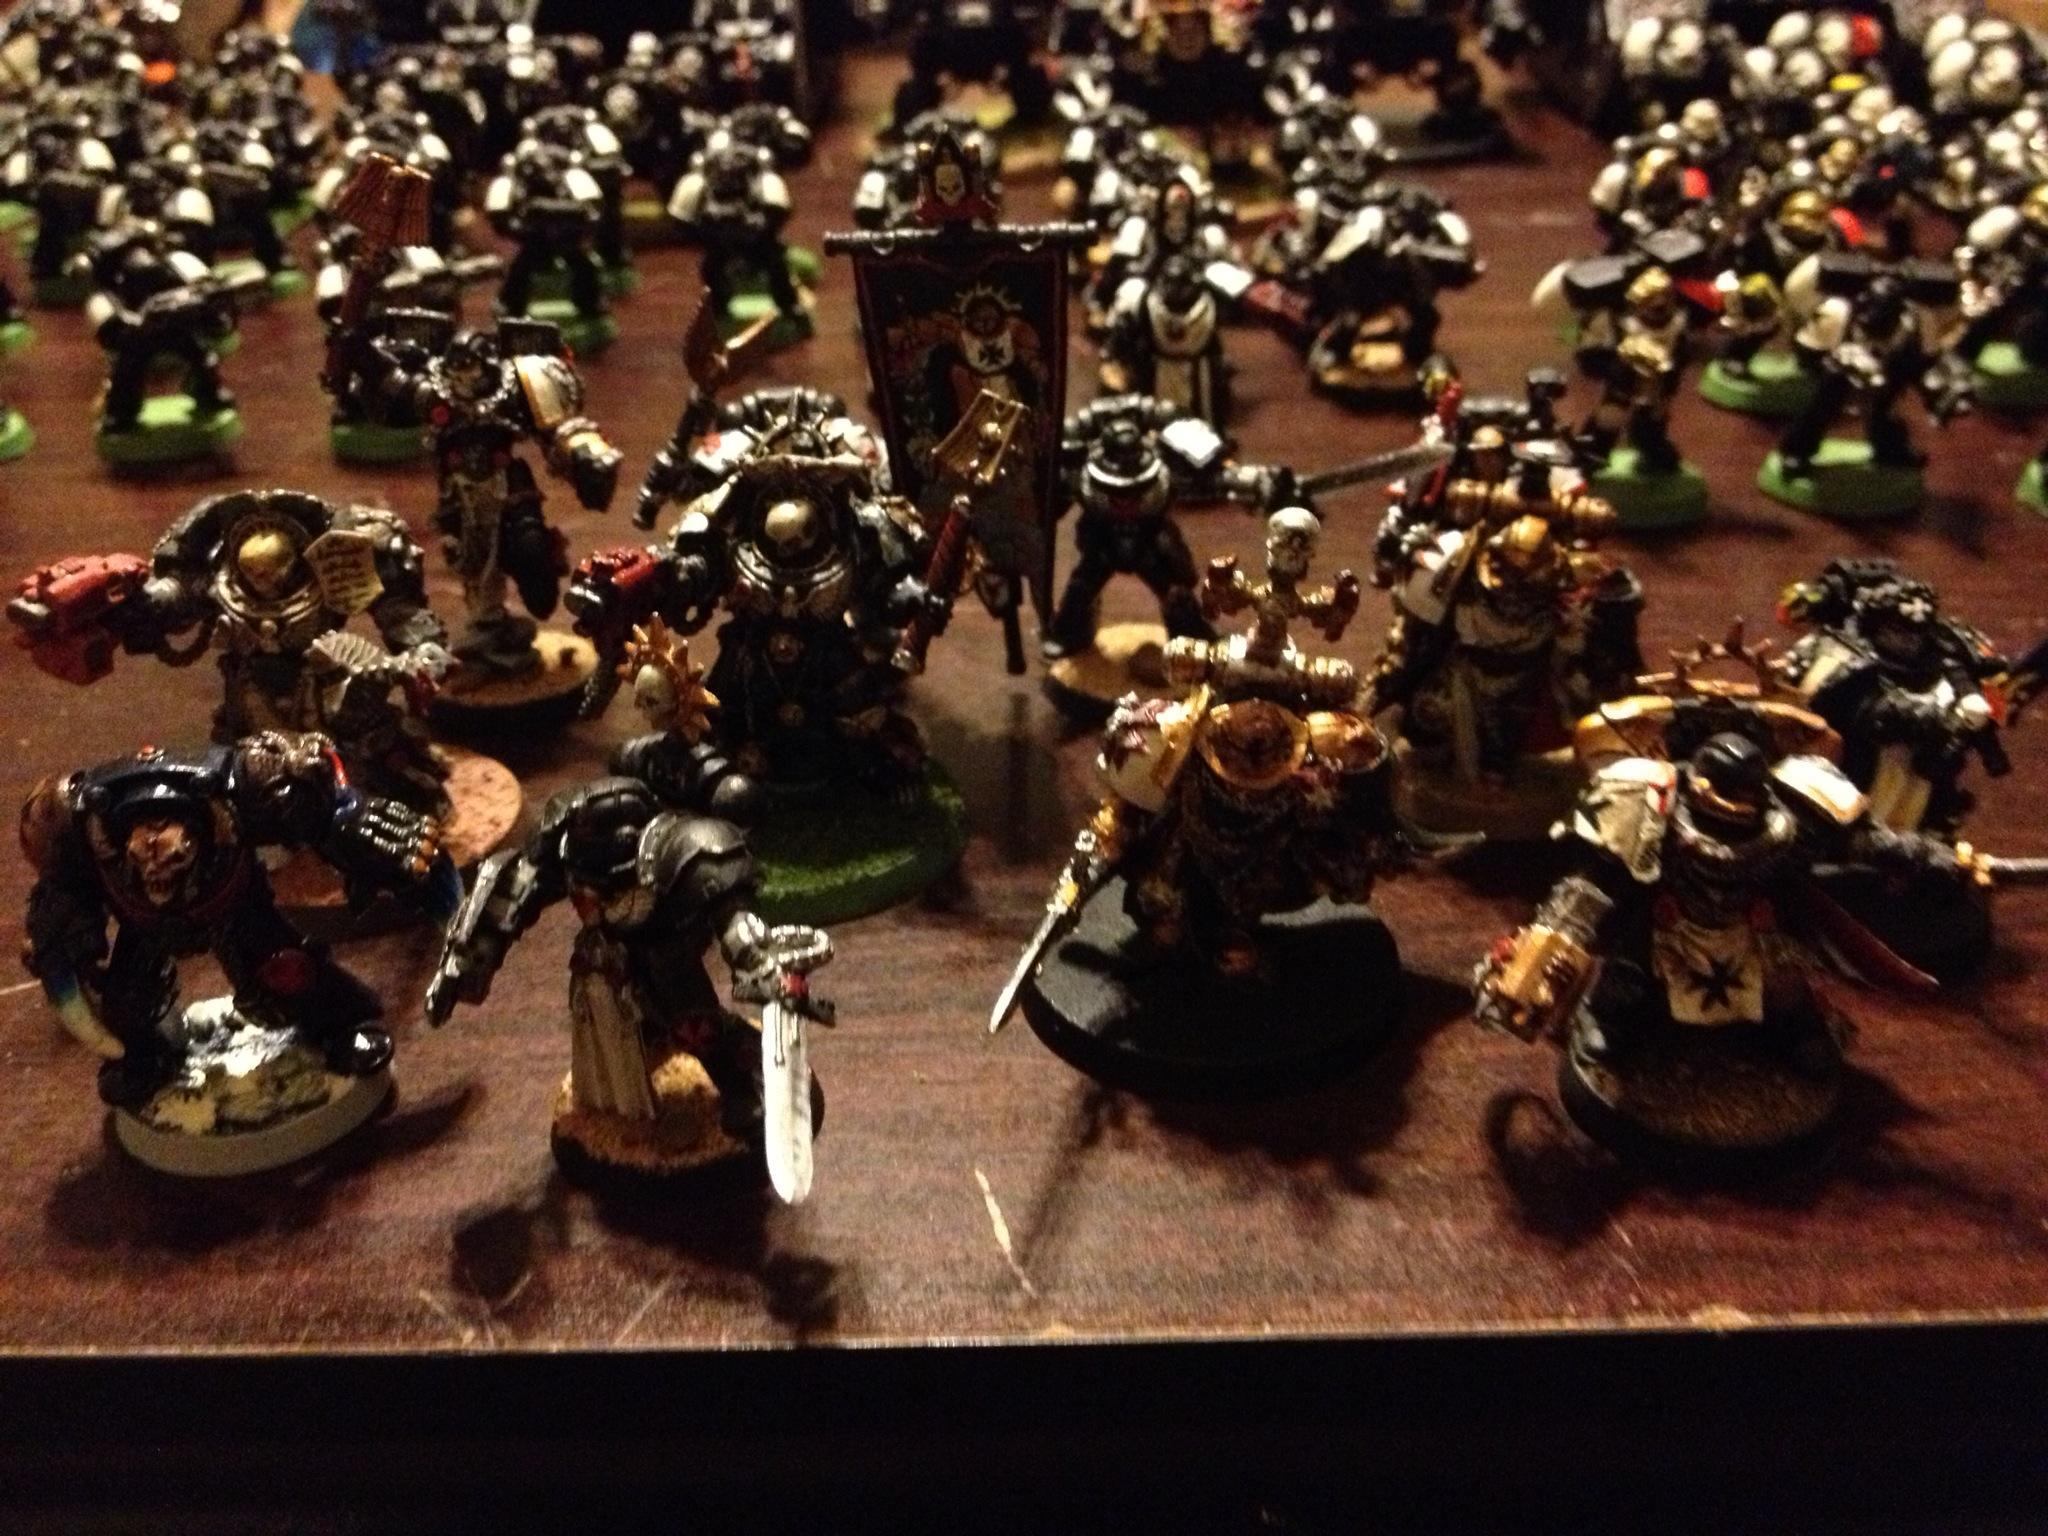 Black Templars, Grimaldus